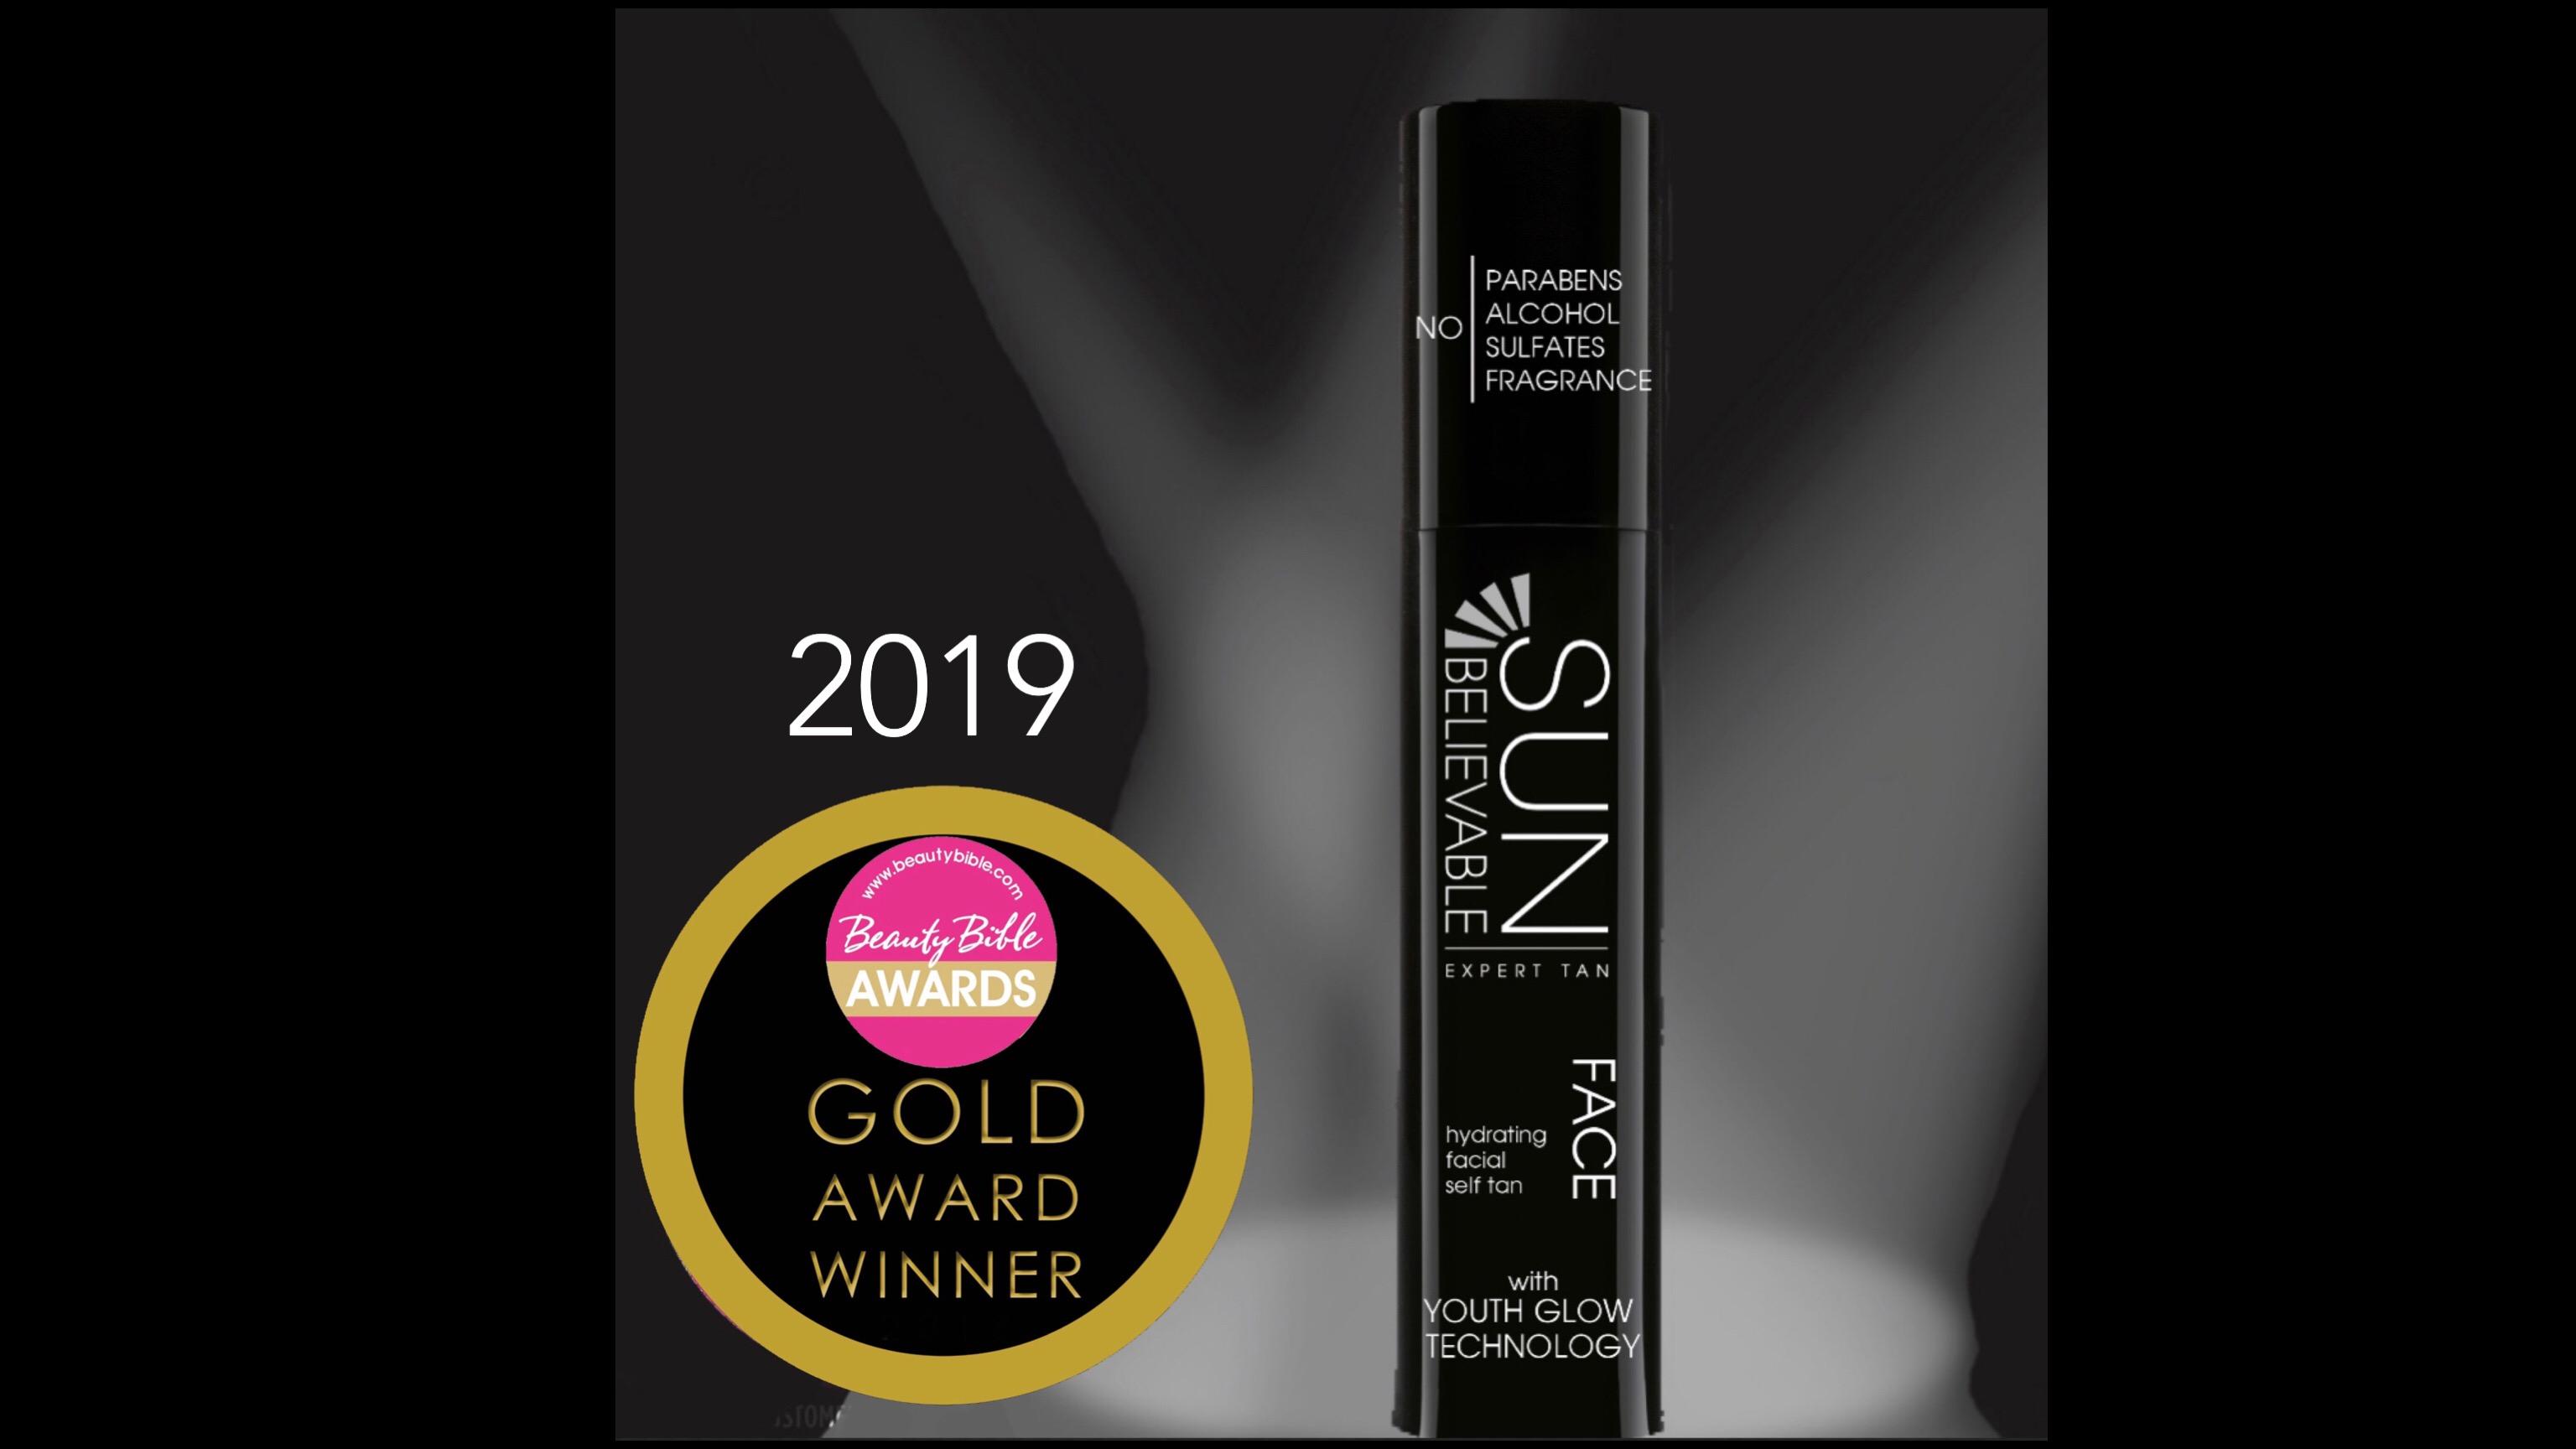 Beauty Bible Awards 2019